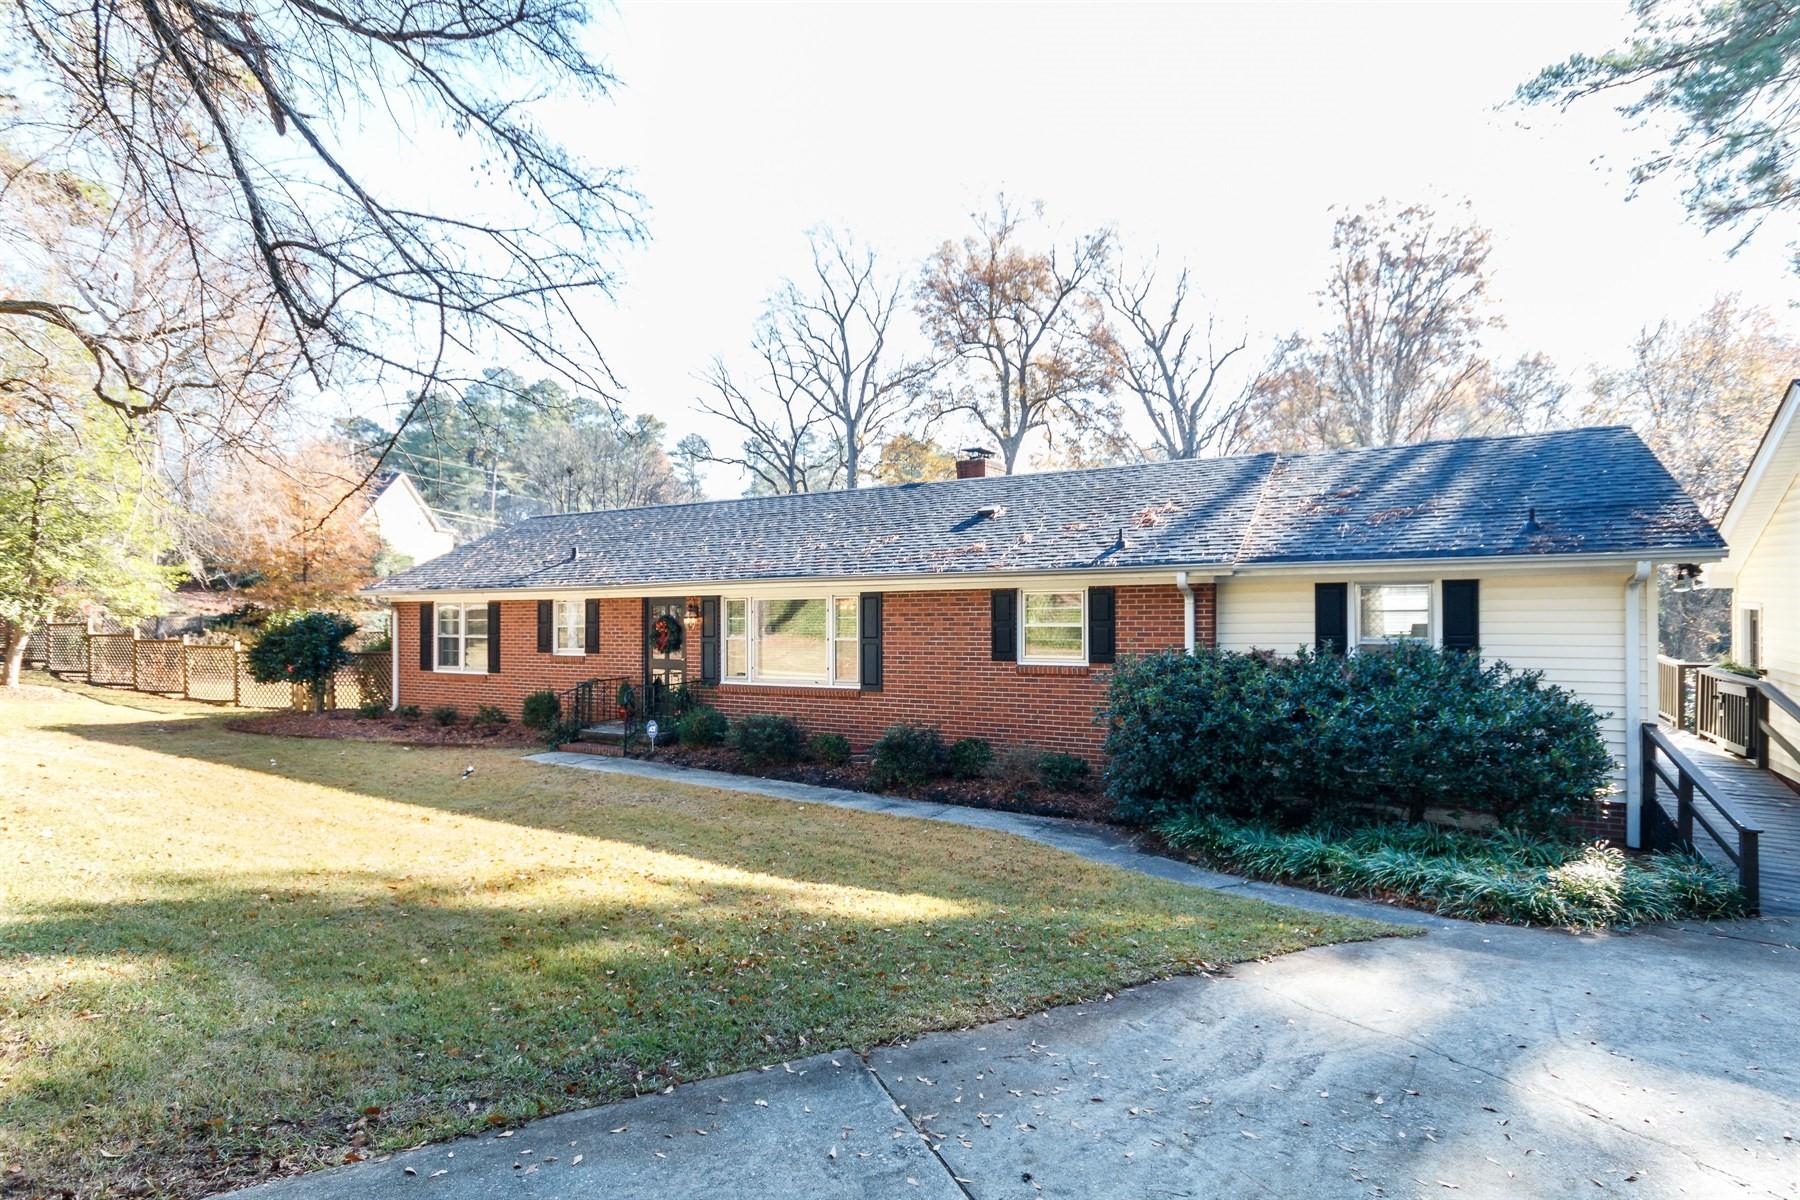 Single Family Home for Sale at Plantation Road Ranch 3034 Plantation Road Raleigh, North Carolina 27608 United States